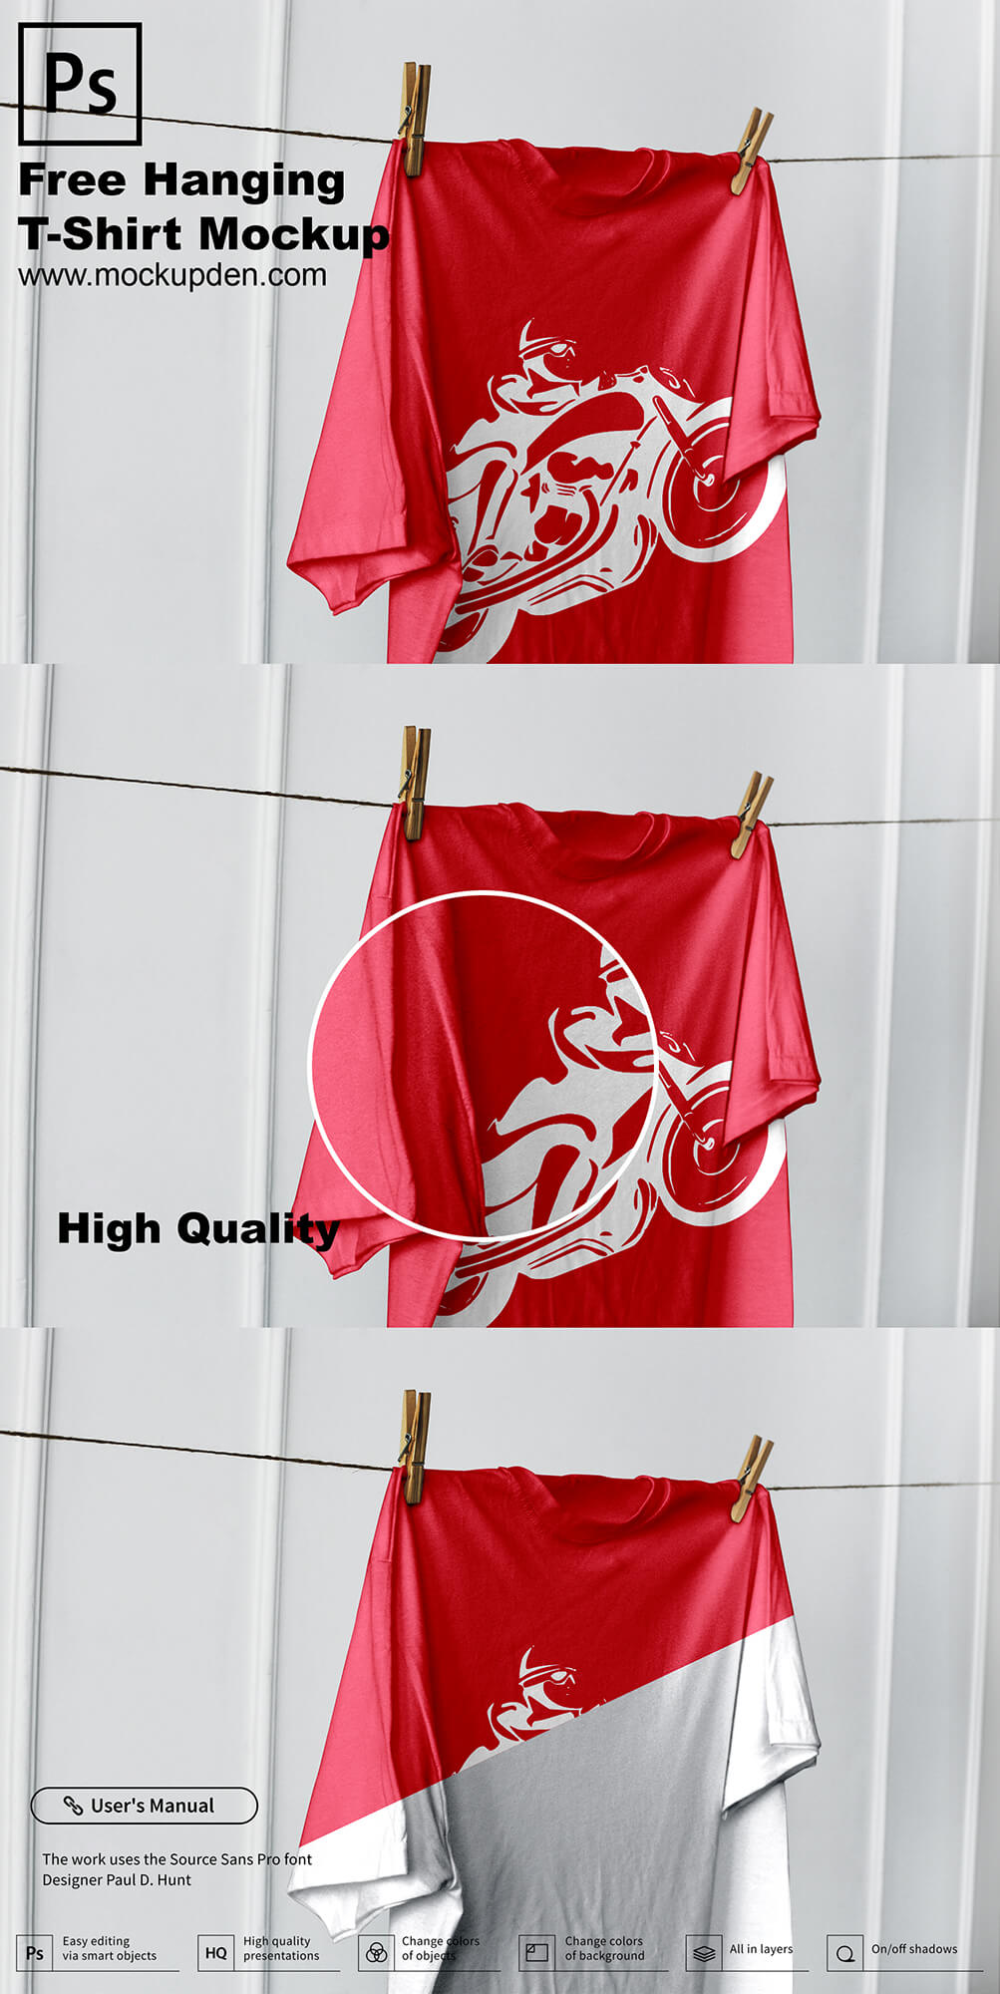 Download Free Hanging T Shirt Mockup Psd Template 1 Shirt Mockup Tshirt Mockup Mockup Psd